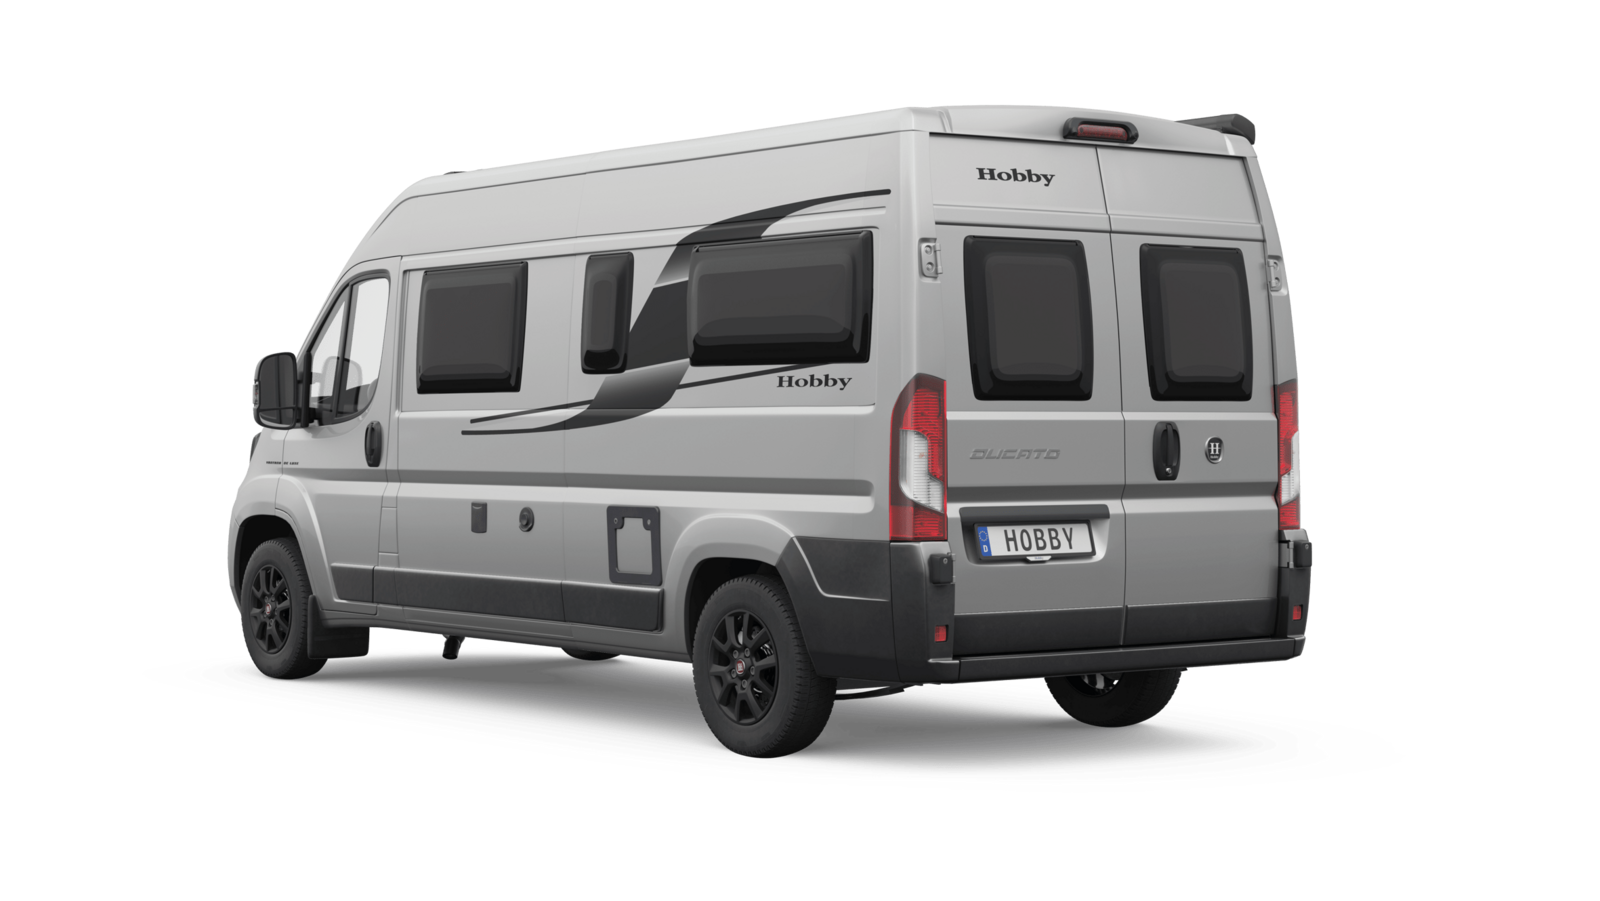 2022-KW-Freisteller-Heck-Vantana-De-Luxe-K60-FT-silber-extra-Fenster-paket-PRESSE-lowres